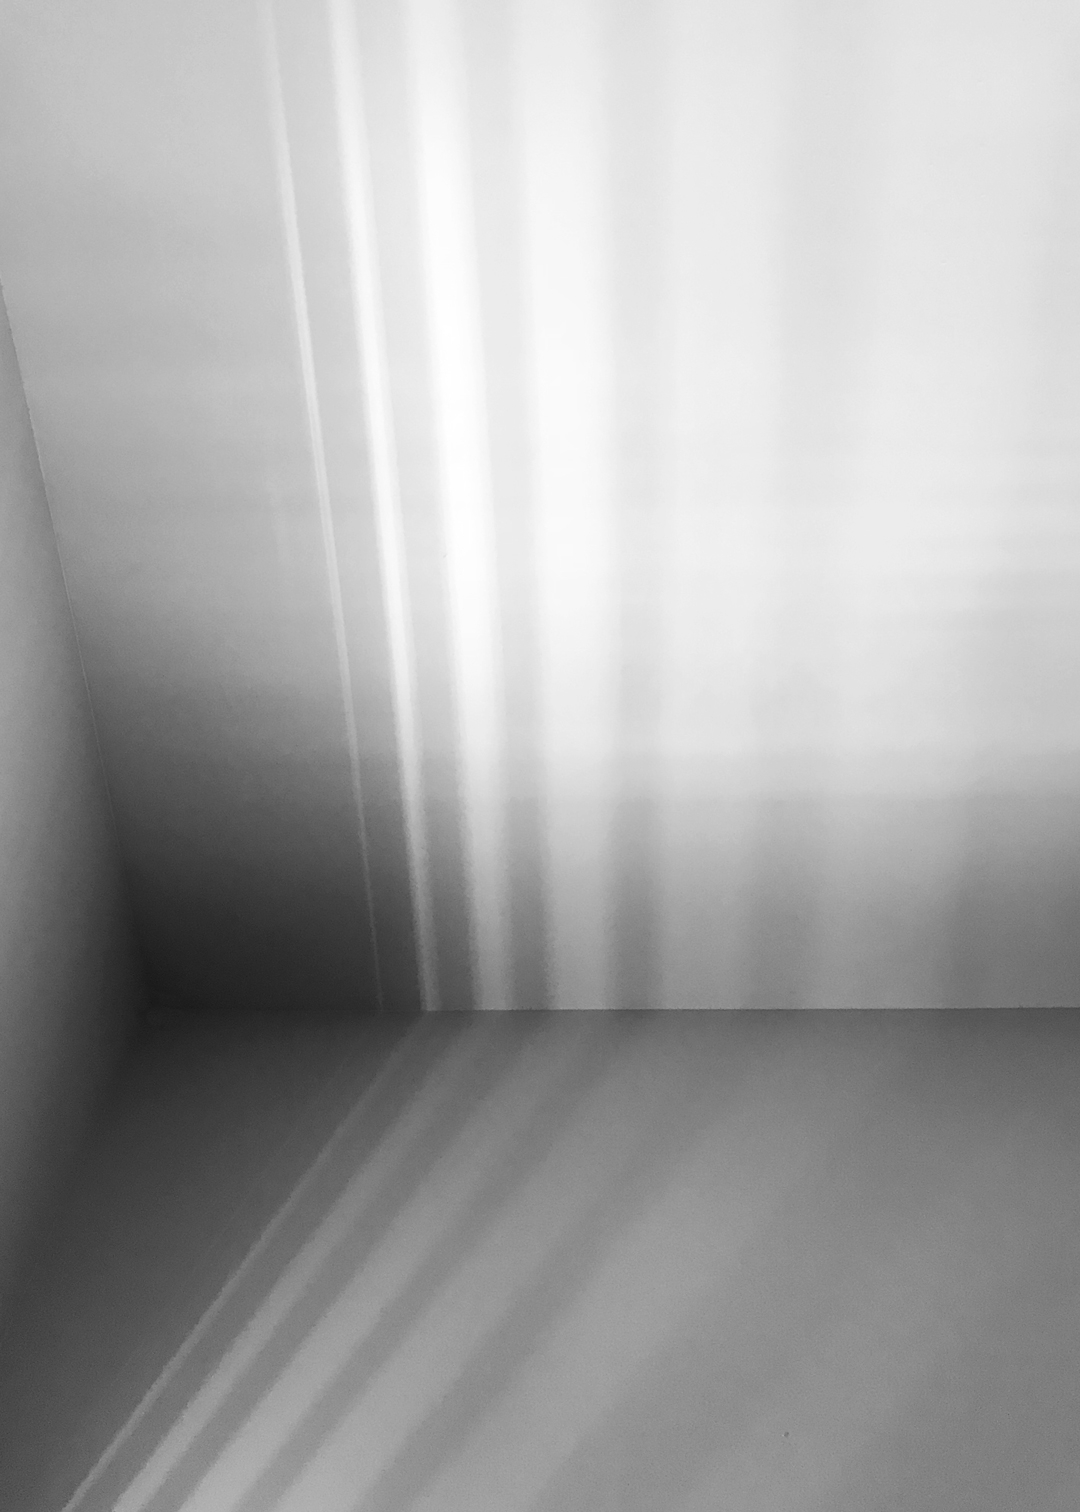 light-pattern-lines-M-bw-classic-1080 (1)